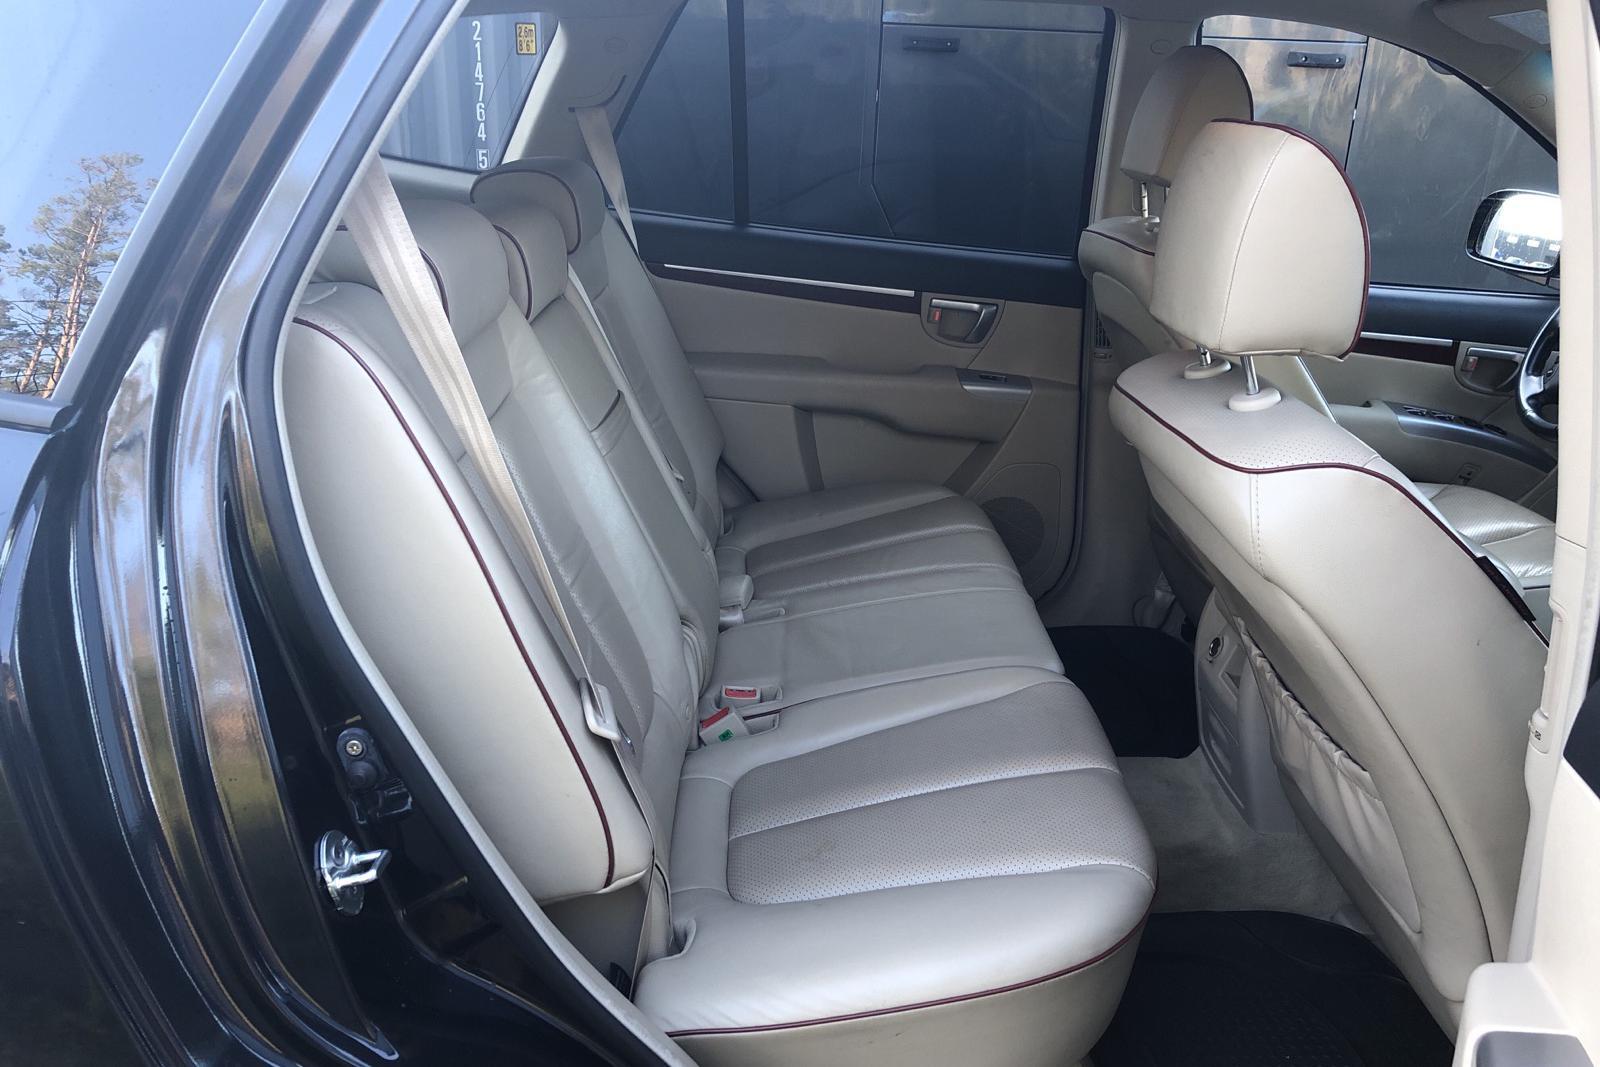 Hyundai Santa Fé 2.2 CRDi (155hk) - 200 190 km - Automatic - black - 2007